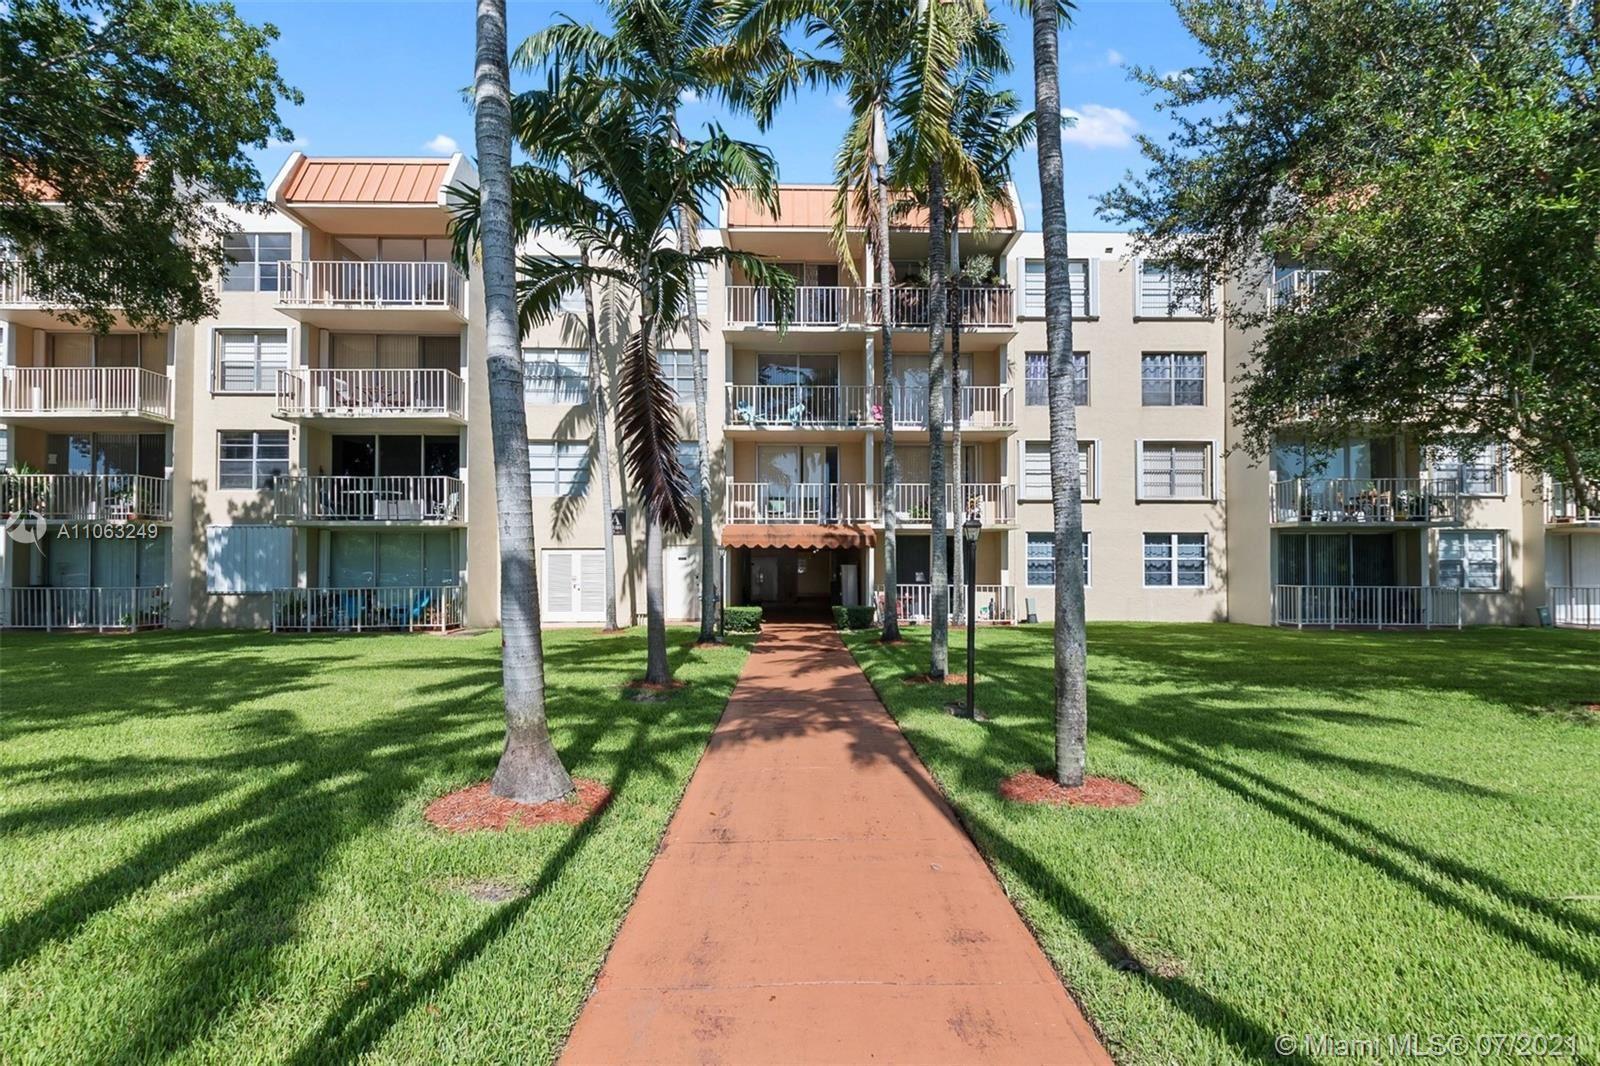 13100 SW 92nd Ave #A-308, Miami, FL 33176 - #: A11063249